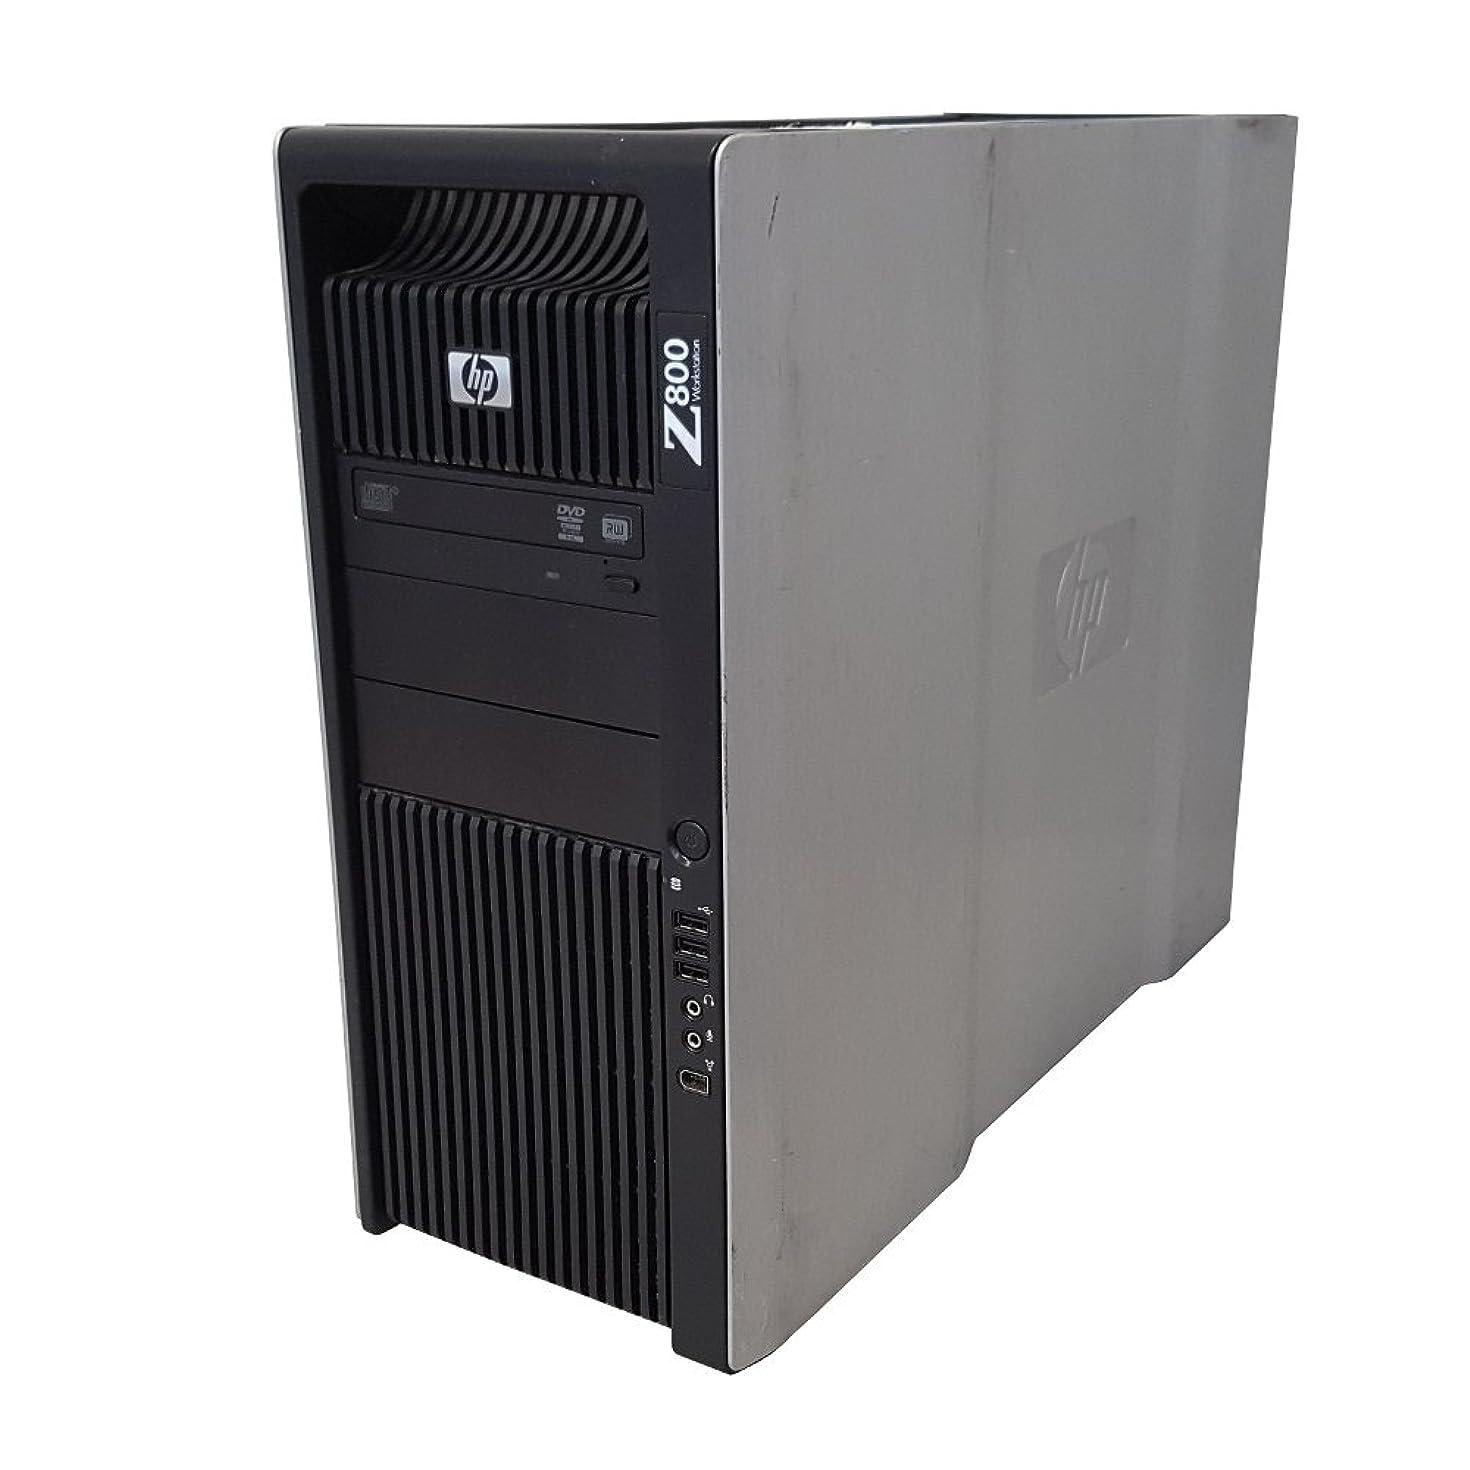 PCSP Z800 Photoshop/Video Editing Workstation Rig - 2X 3.06GHz 12-Cores Total 32GB RAM 1TB SSD + 4TB HDD Nvidia Quadro 5000 Windows 10 Pro (Renewed)